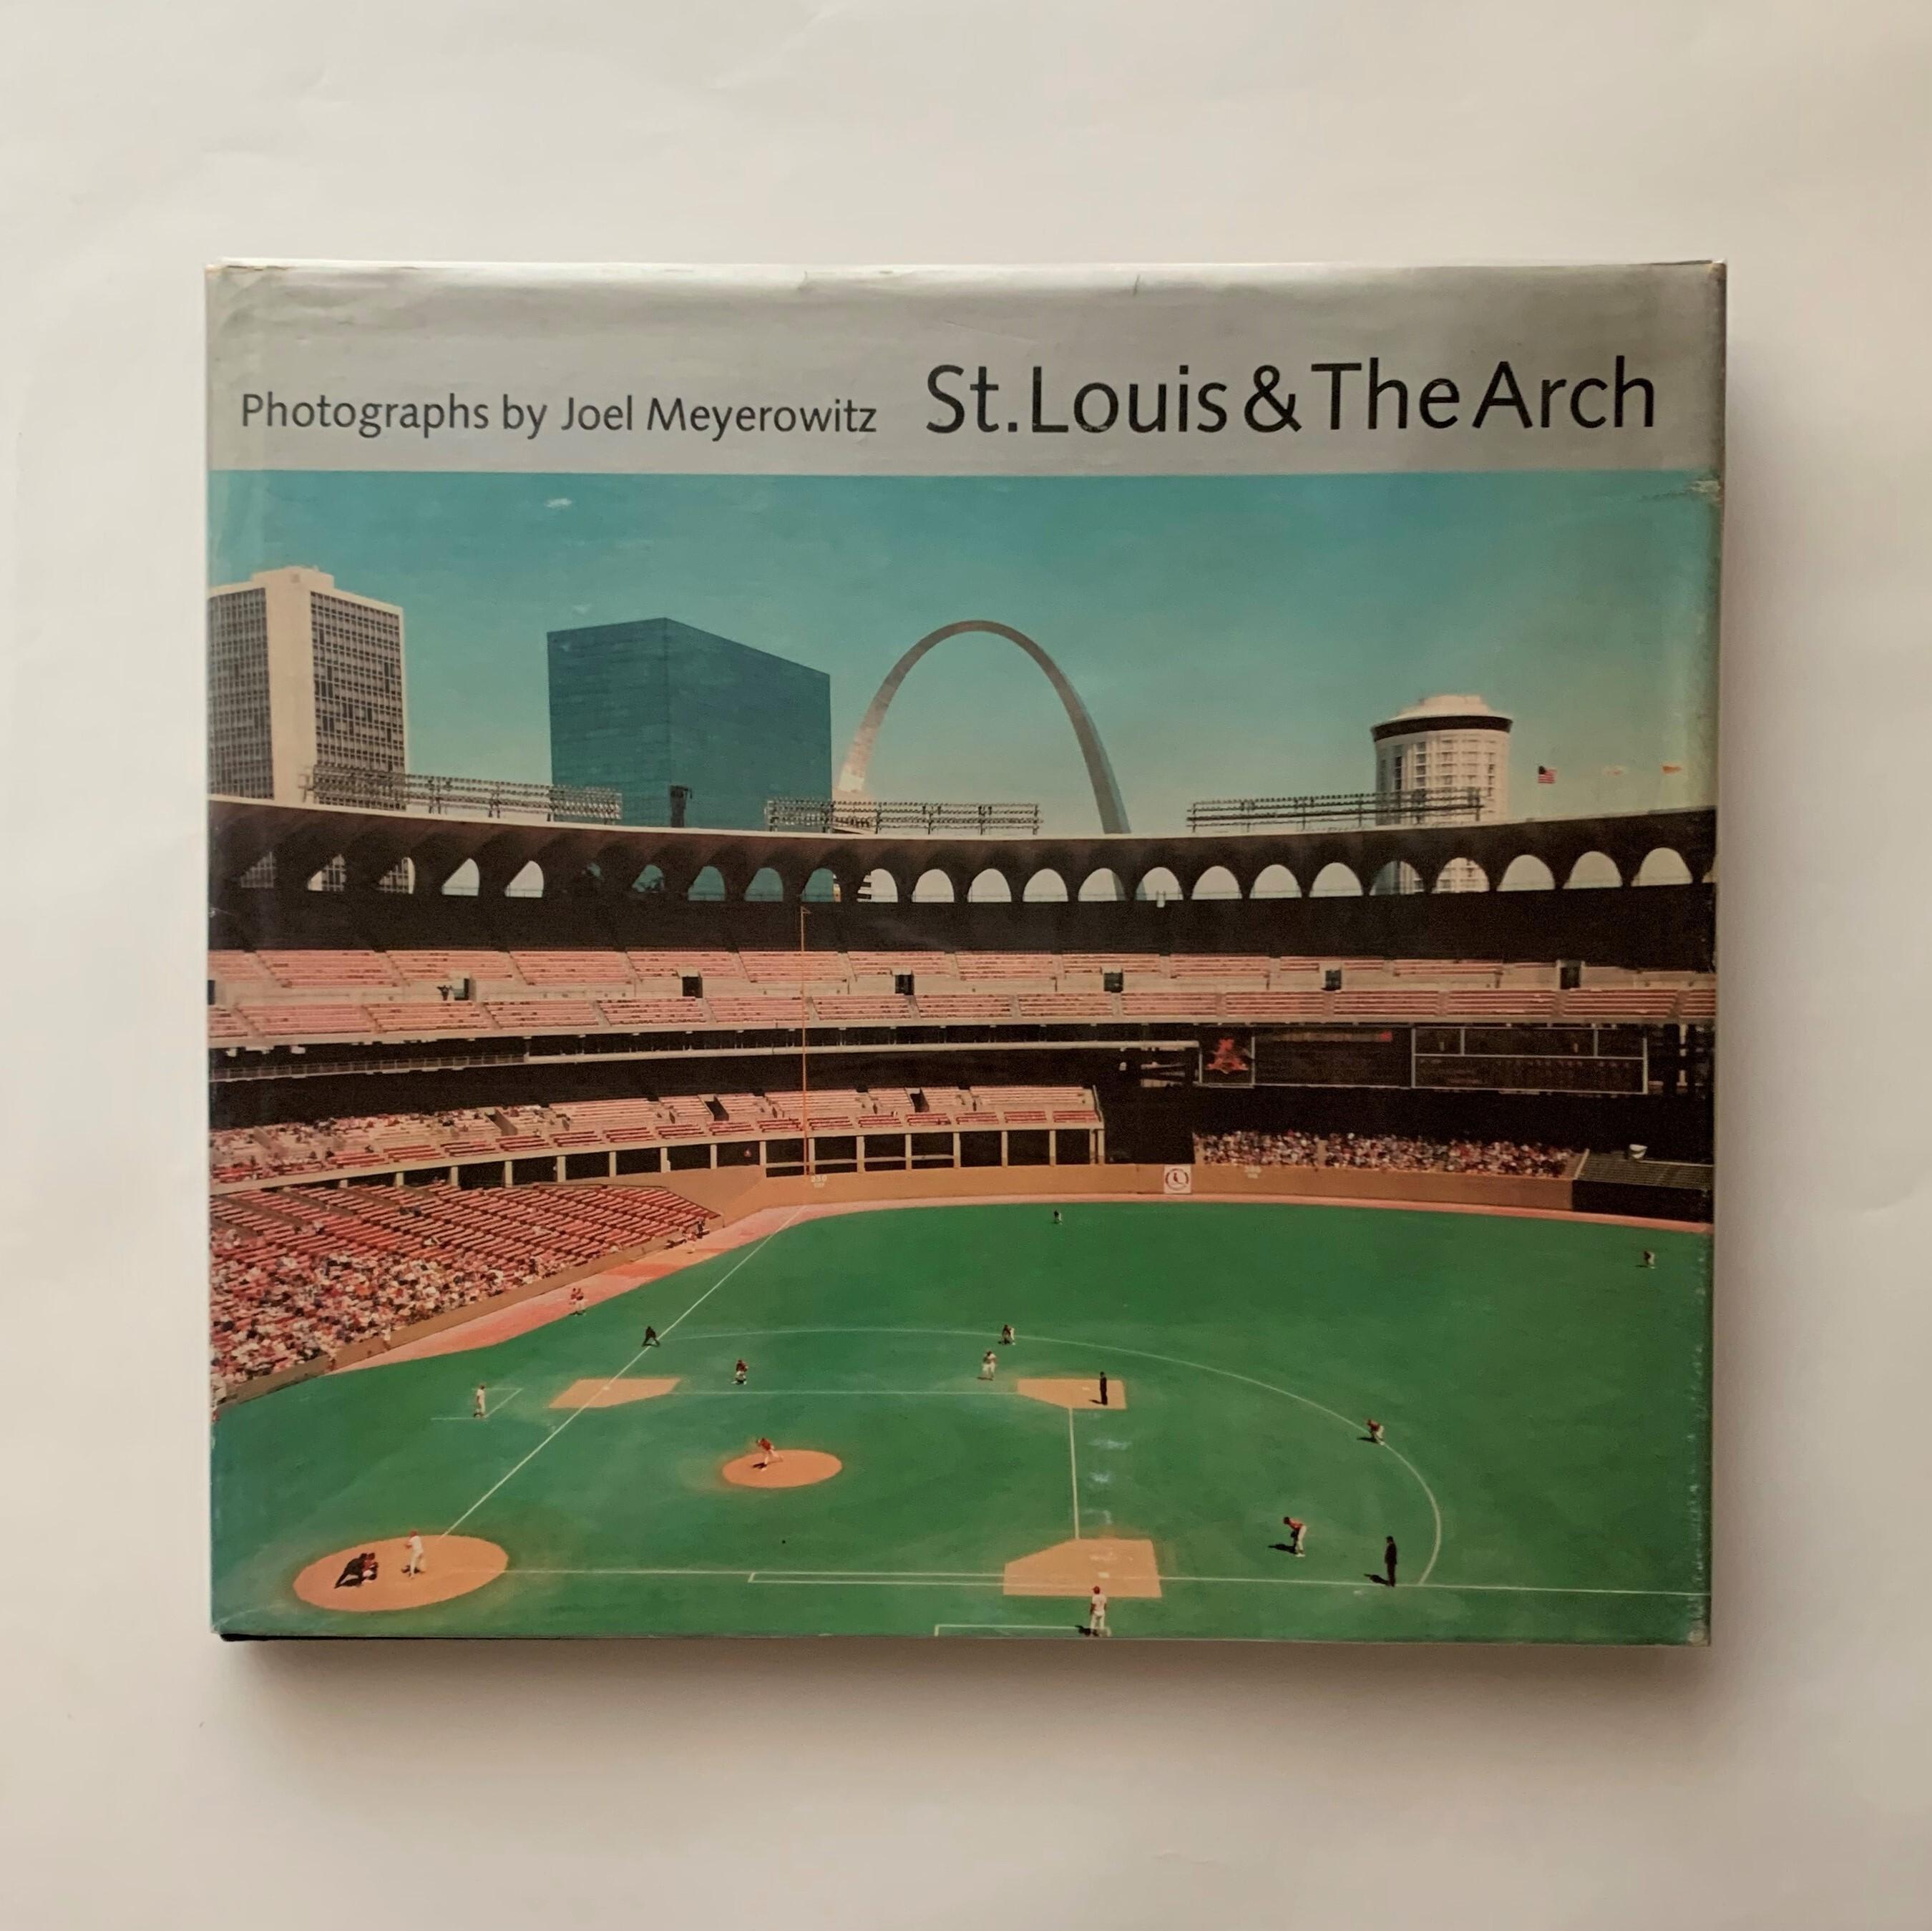 ST. LOUIS & THE ARCH  /  Joel Meyerowitz ジョエル・マイヤーヴィッツ